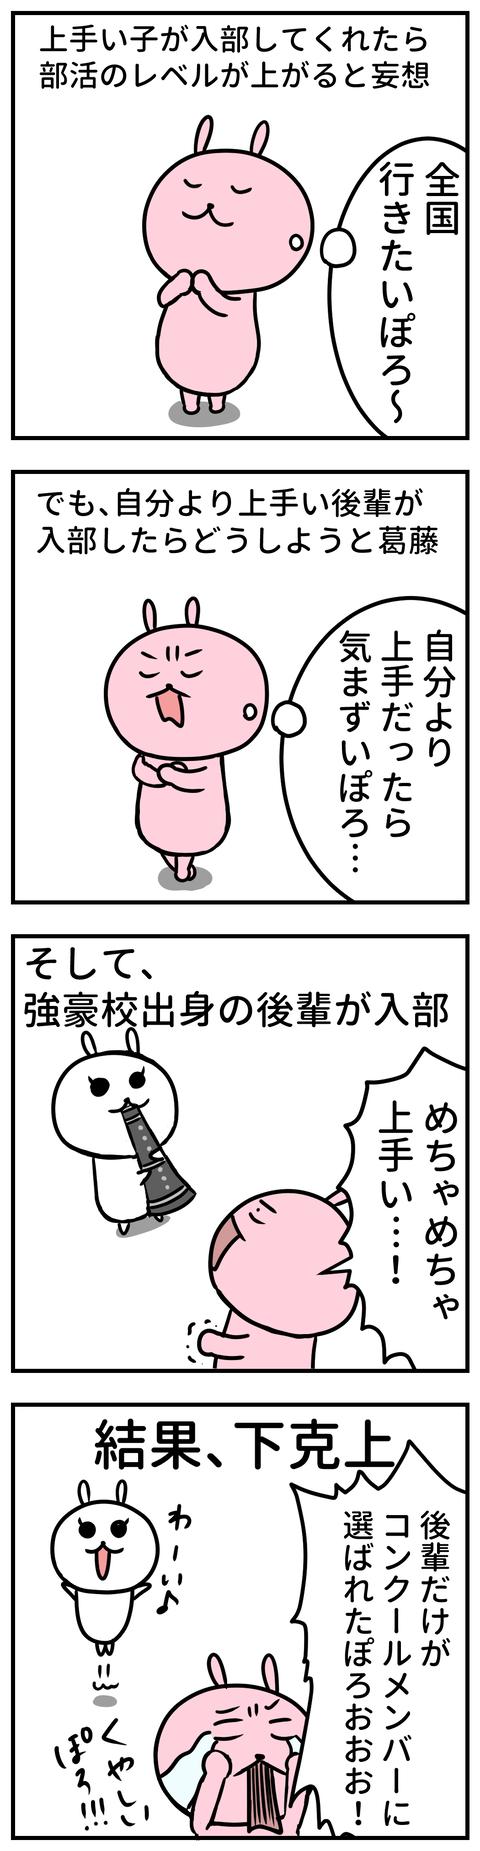 manga-yuzuporo113-1